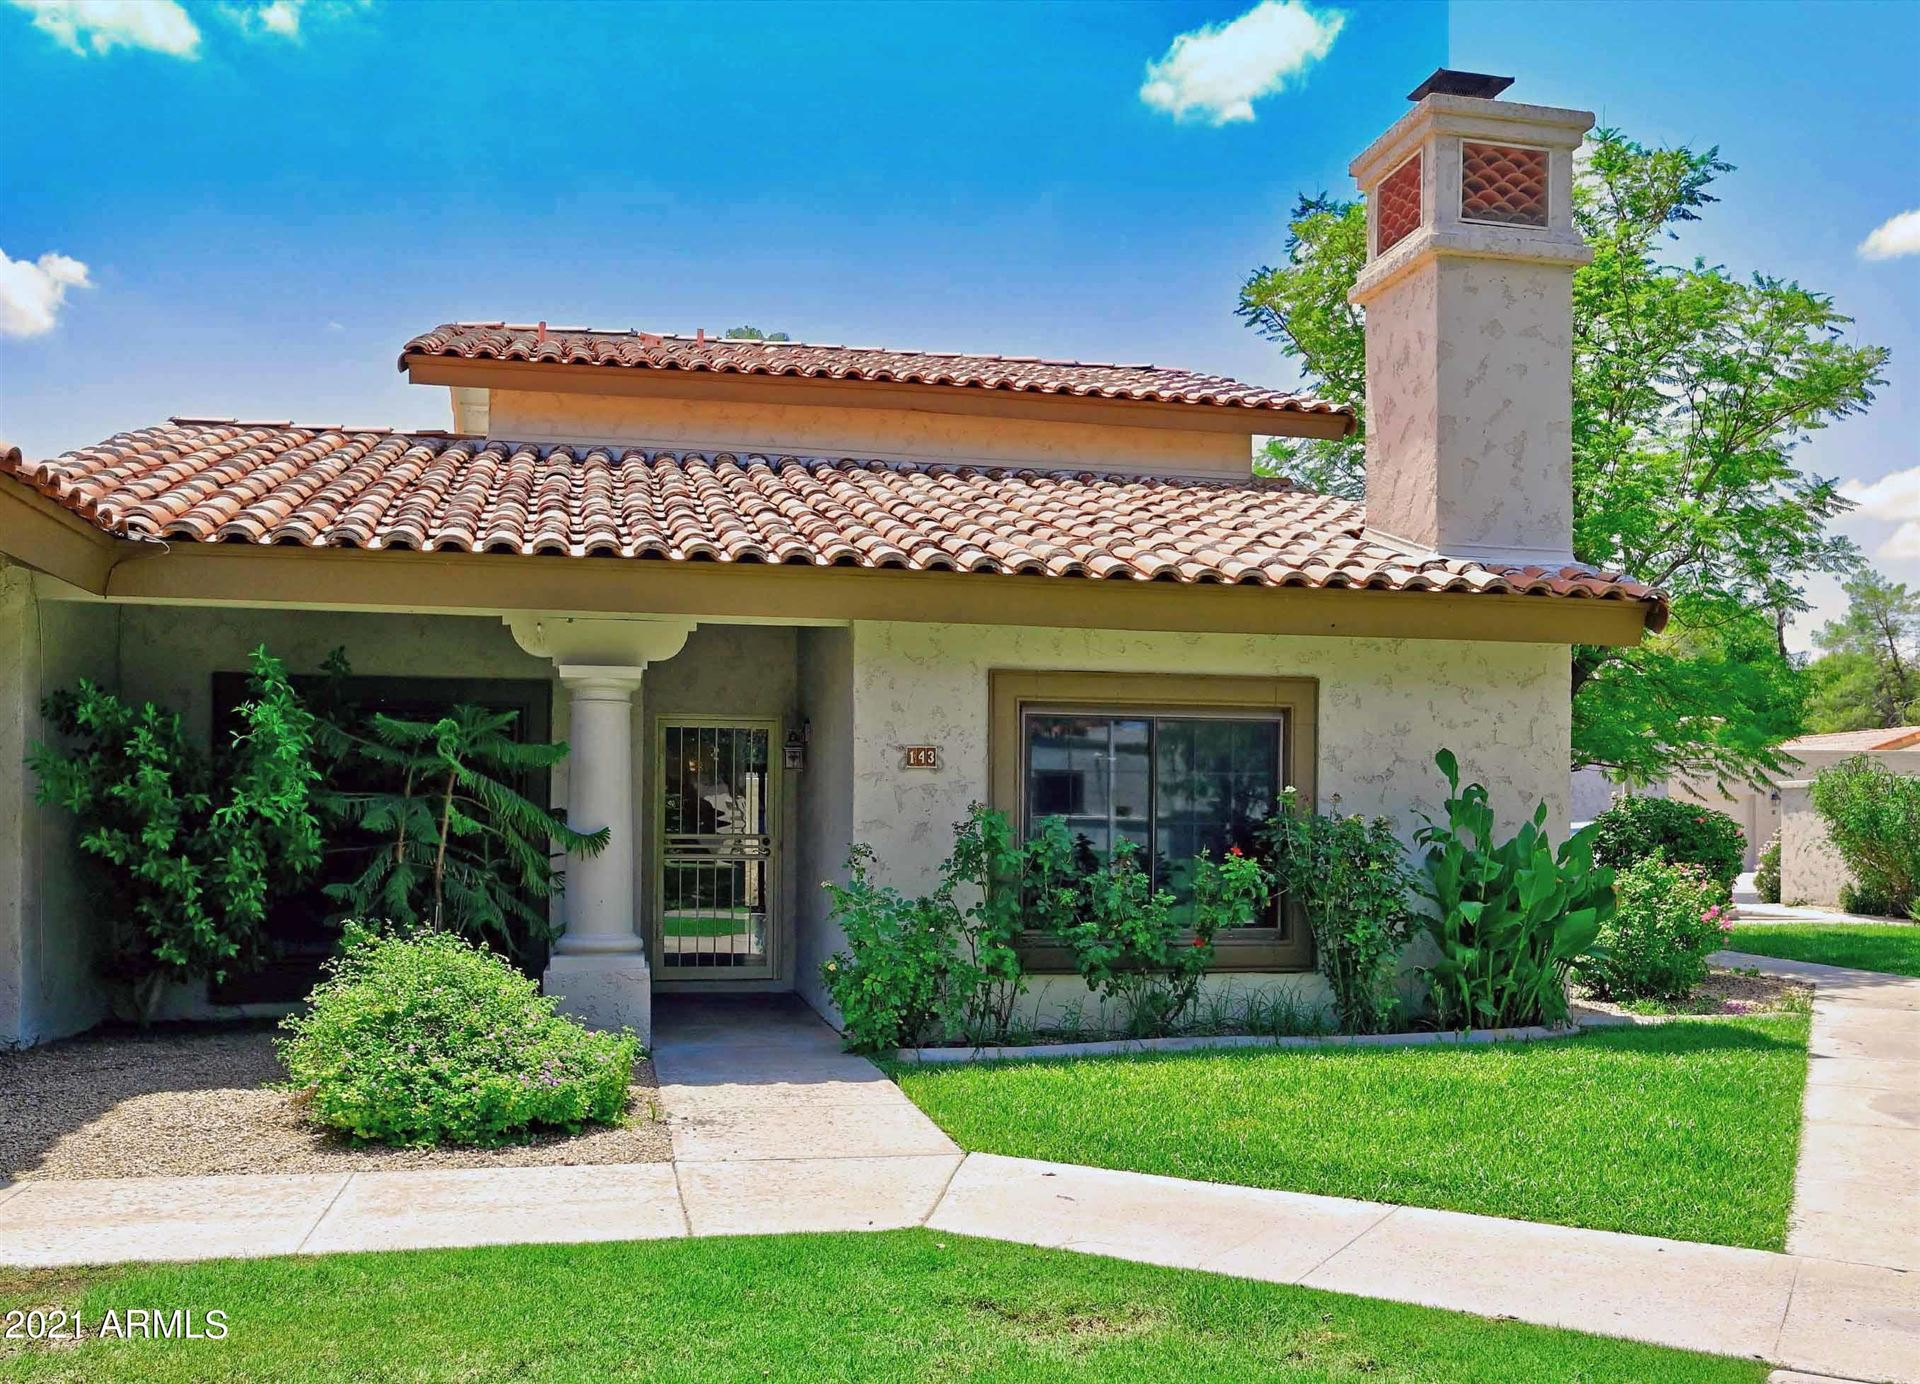 Photo of 6349 N 78TH Street #143, Scottsdale, AZ 85250 (MLS # 6272501)